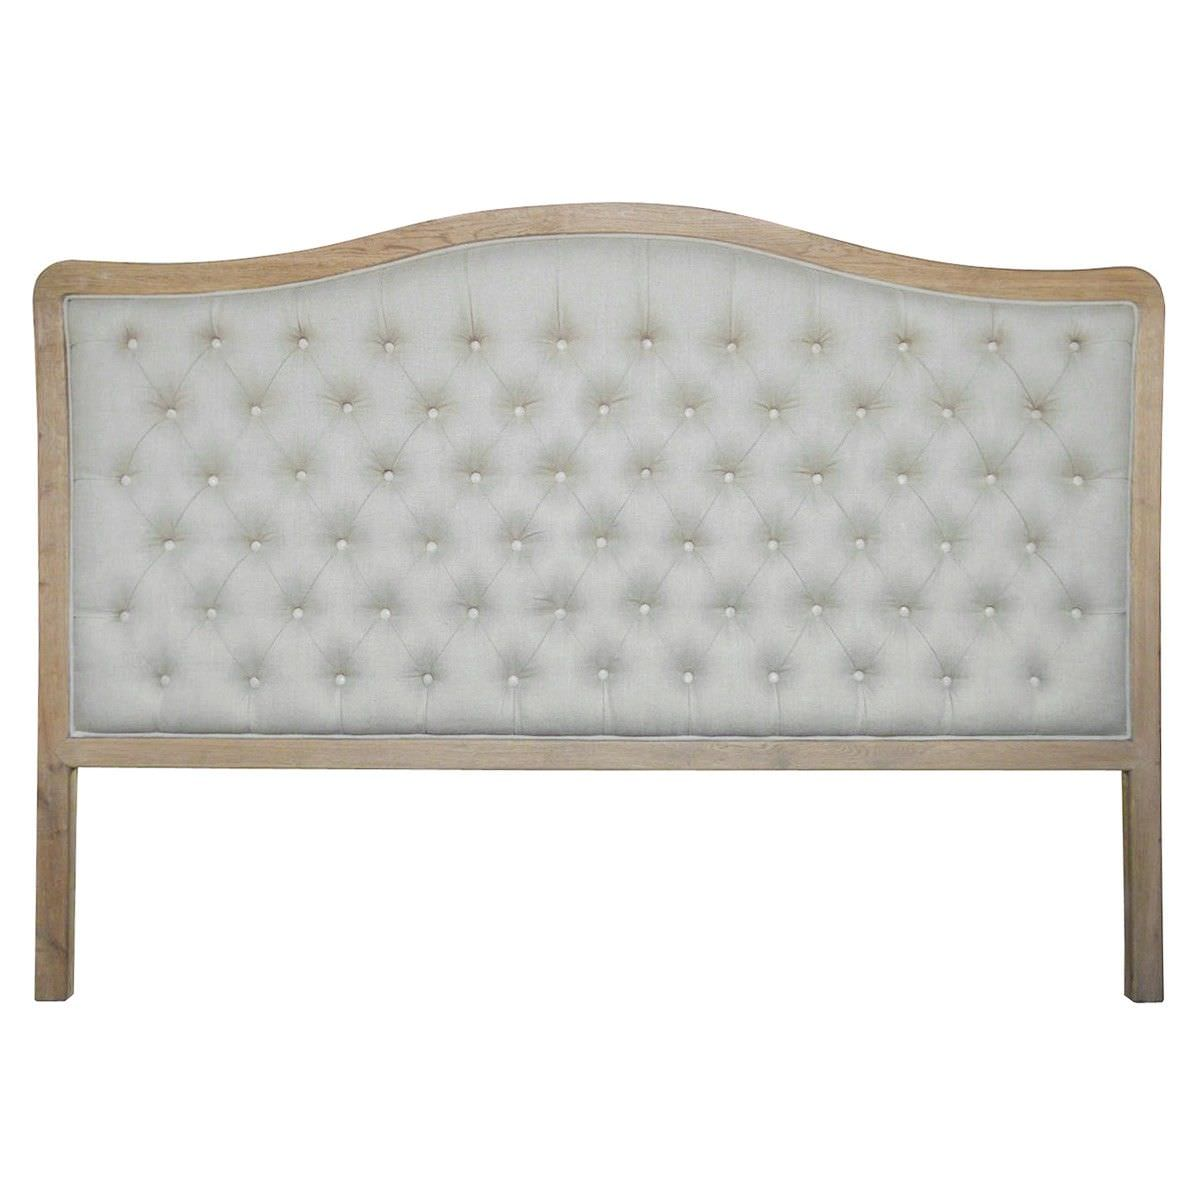 Maison Tufted Linen & Oak Timber Bed Headboard, Queen, Weathered Oak / Oatmeal